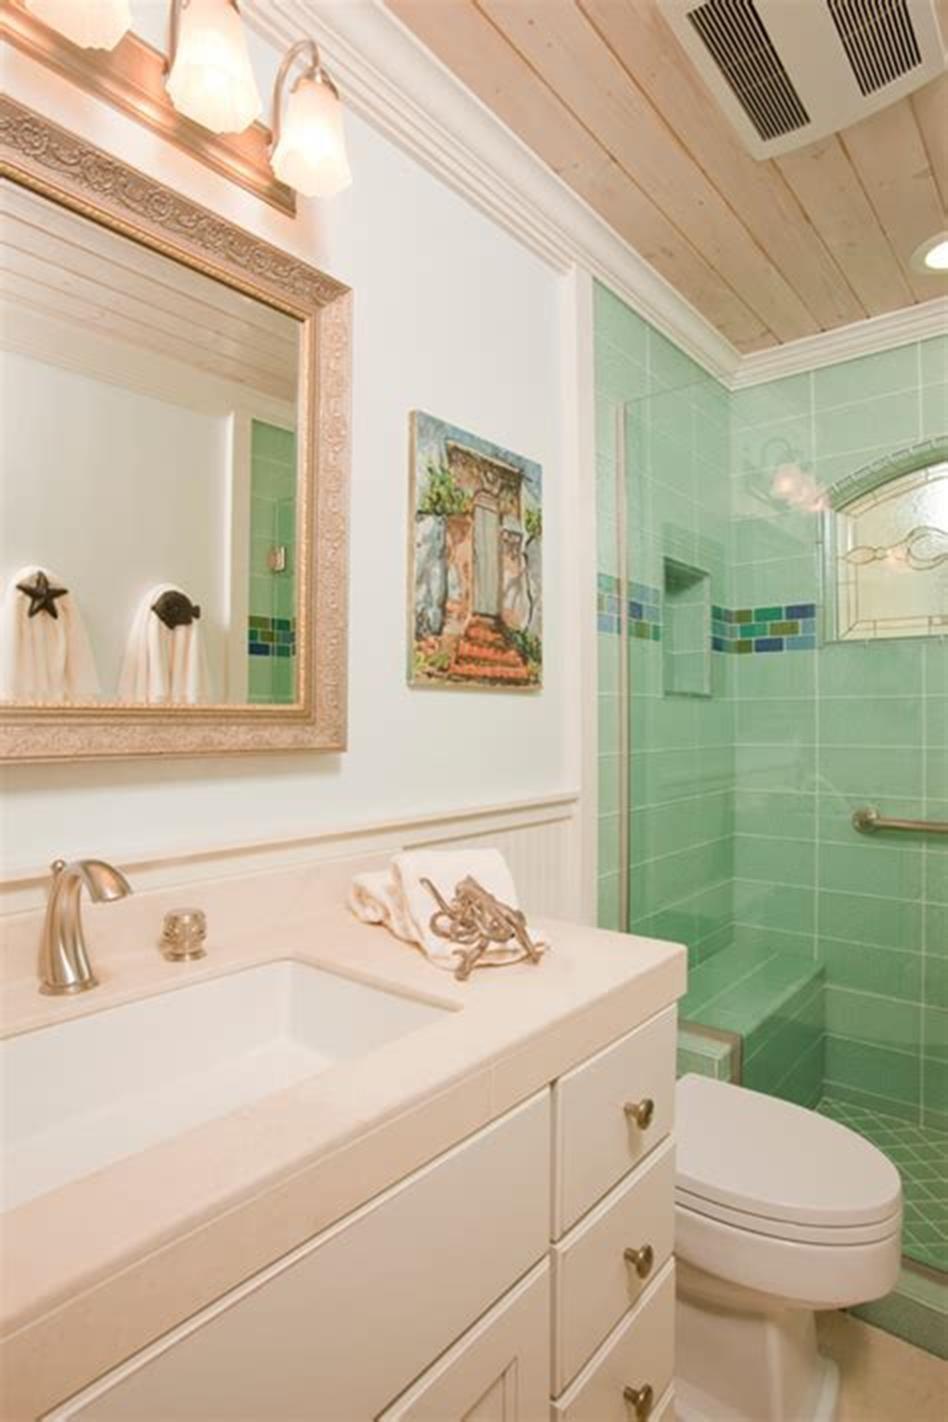 50 Amazing Beach Style Bathroom Design And Decor Ideas With